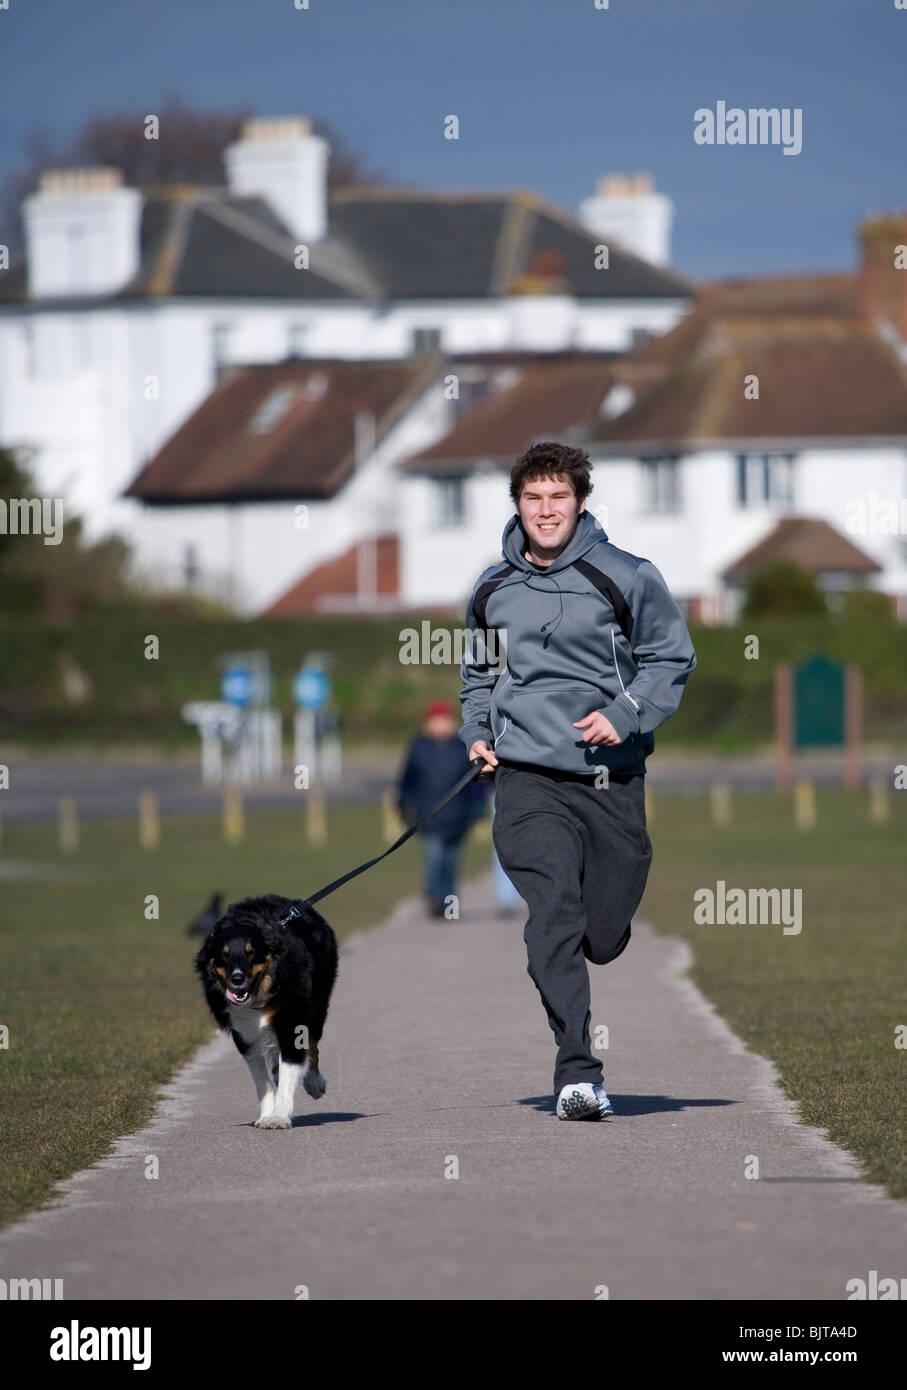 Recreation Adult male dog running with owner Gosport, UK - Stock Image